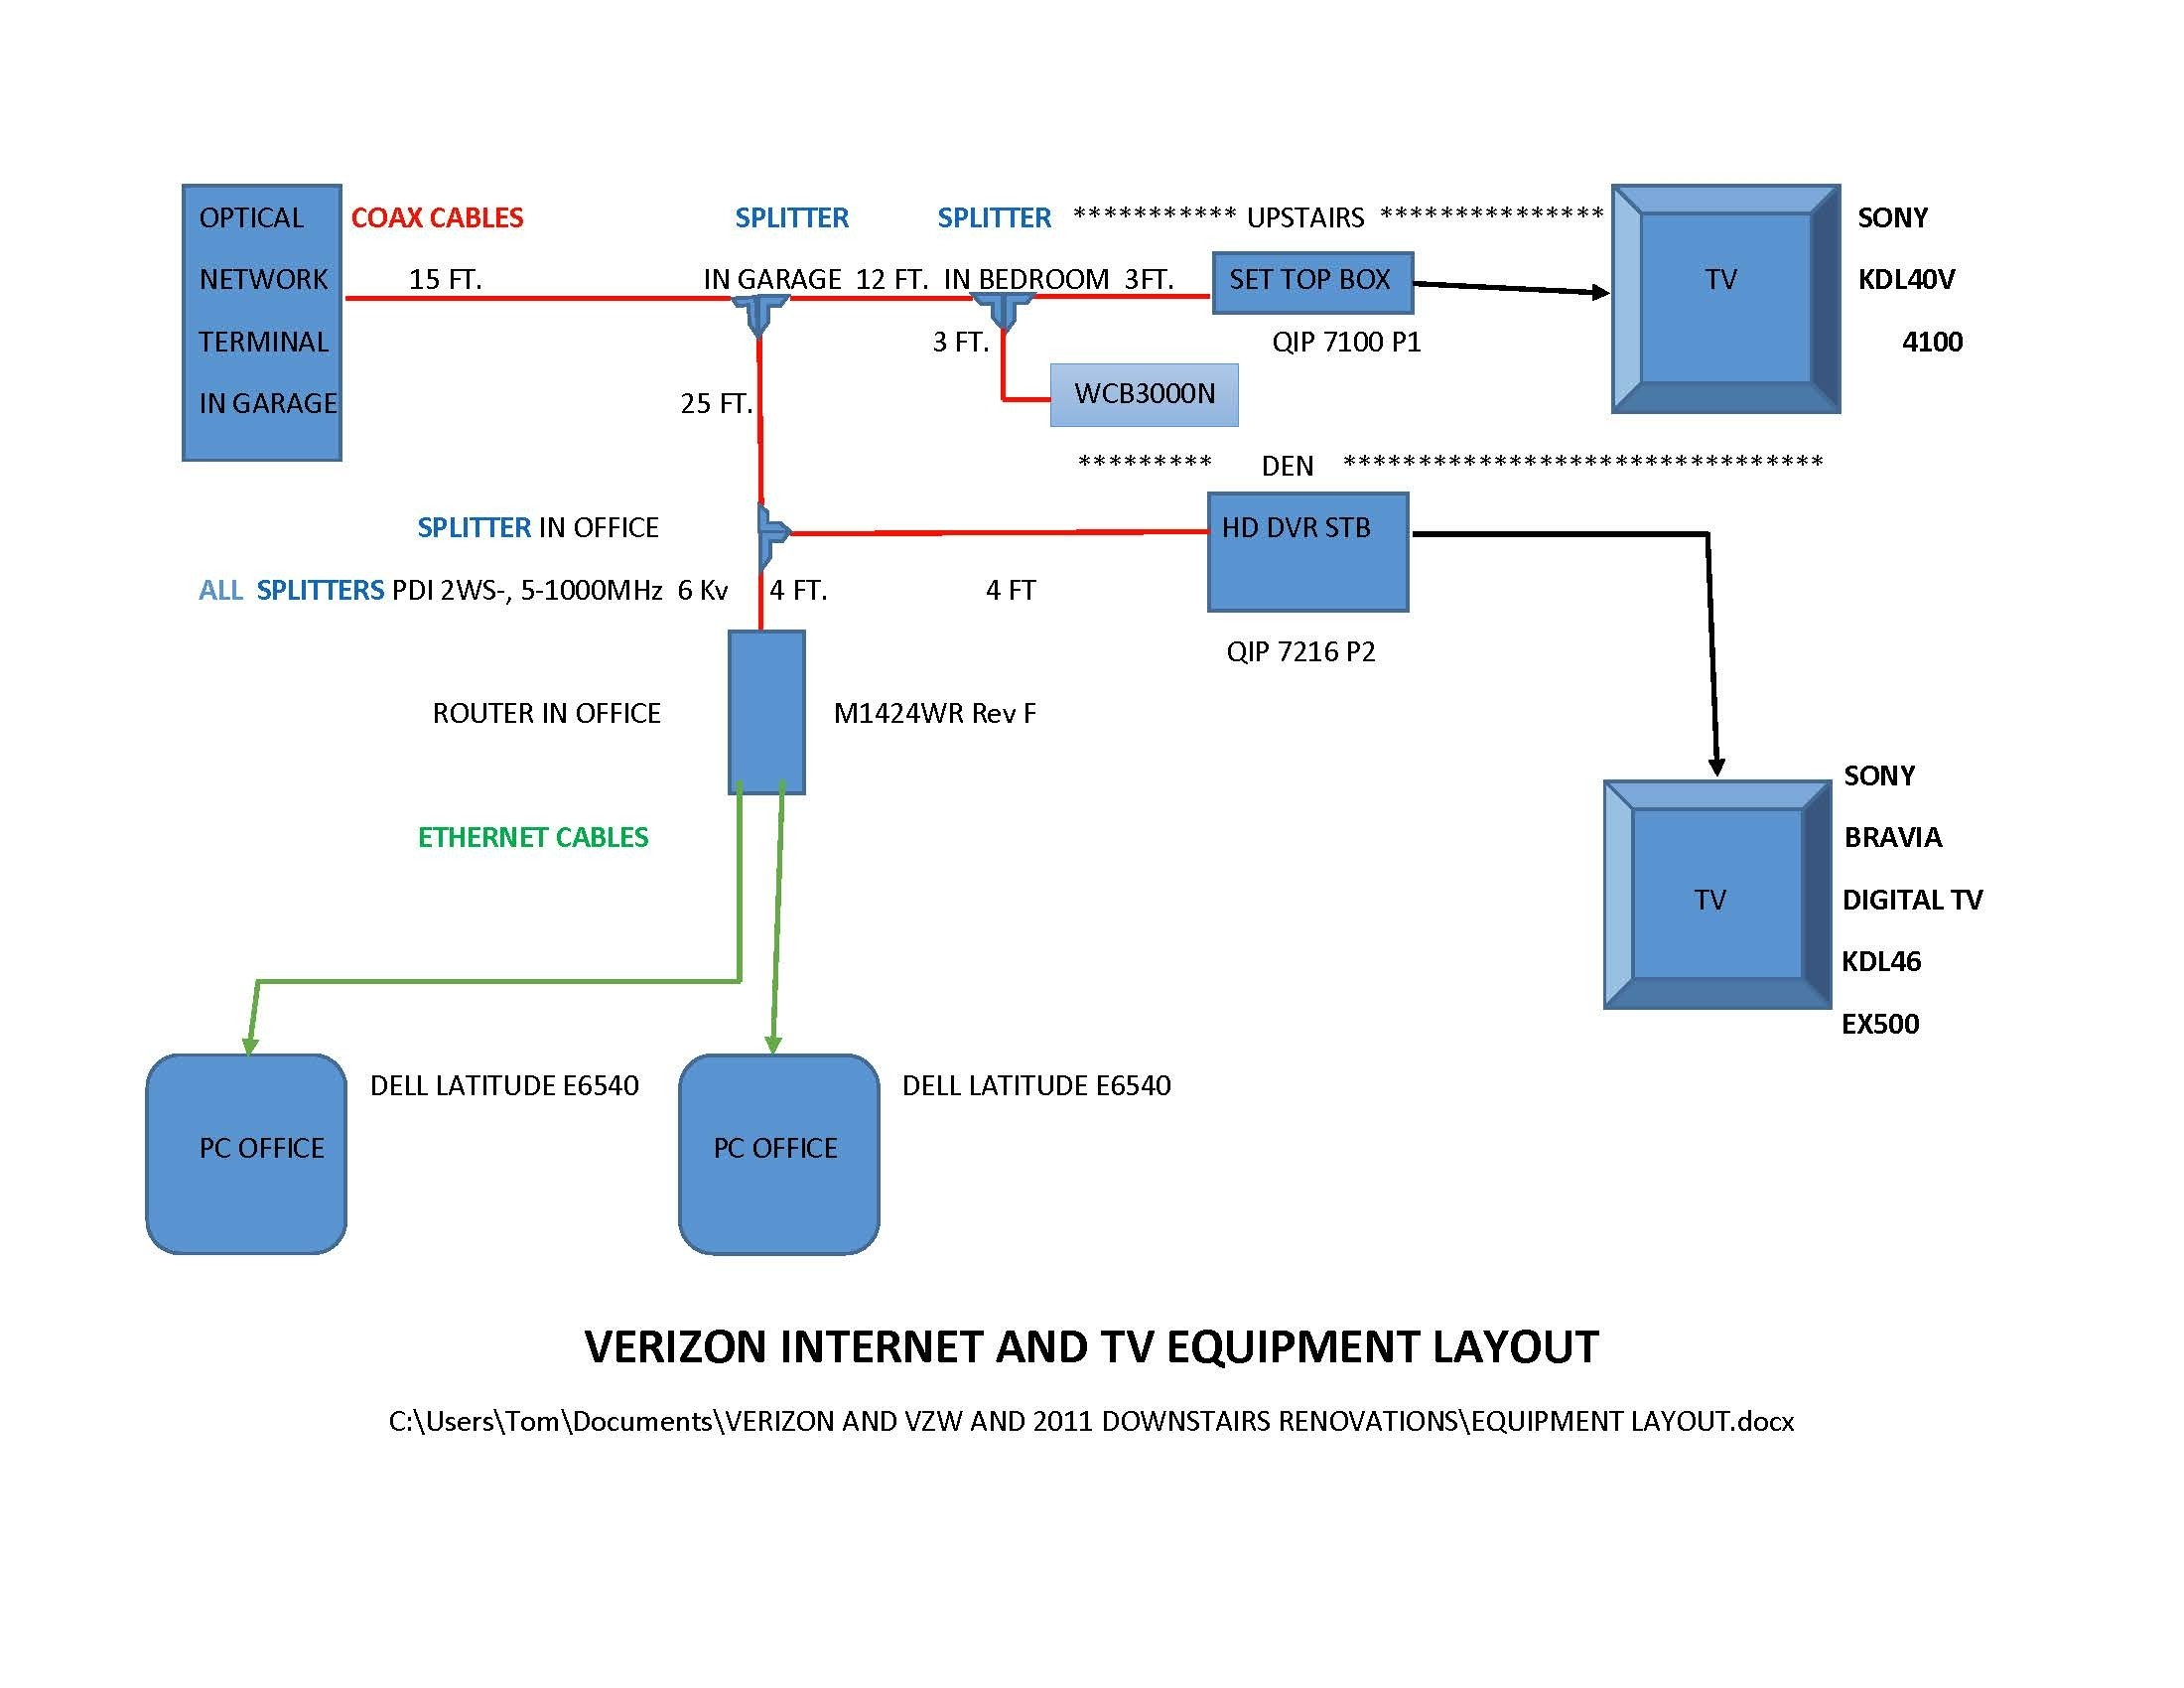 verizon fios internet wiring diagram Download-Fios Wiring Diagram Luxury Verizon Fios Wiring Diagram & Verizon Fios t Question 10-b